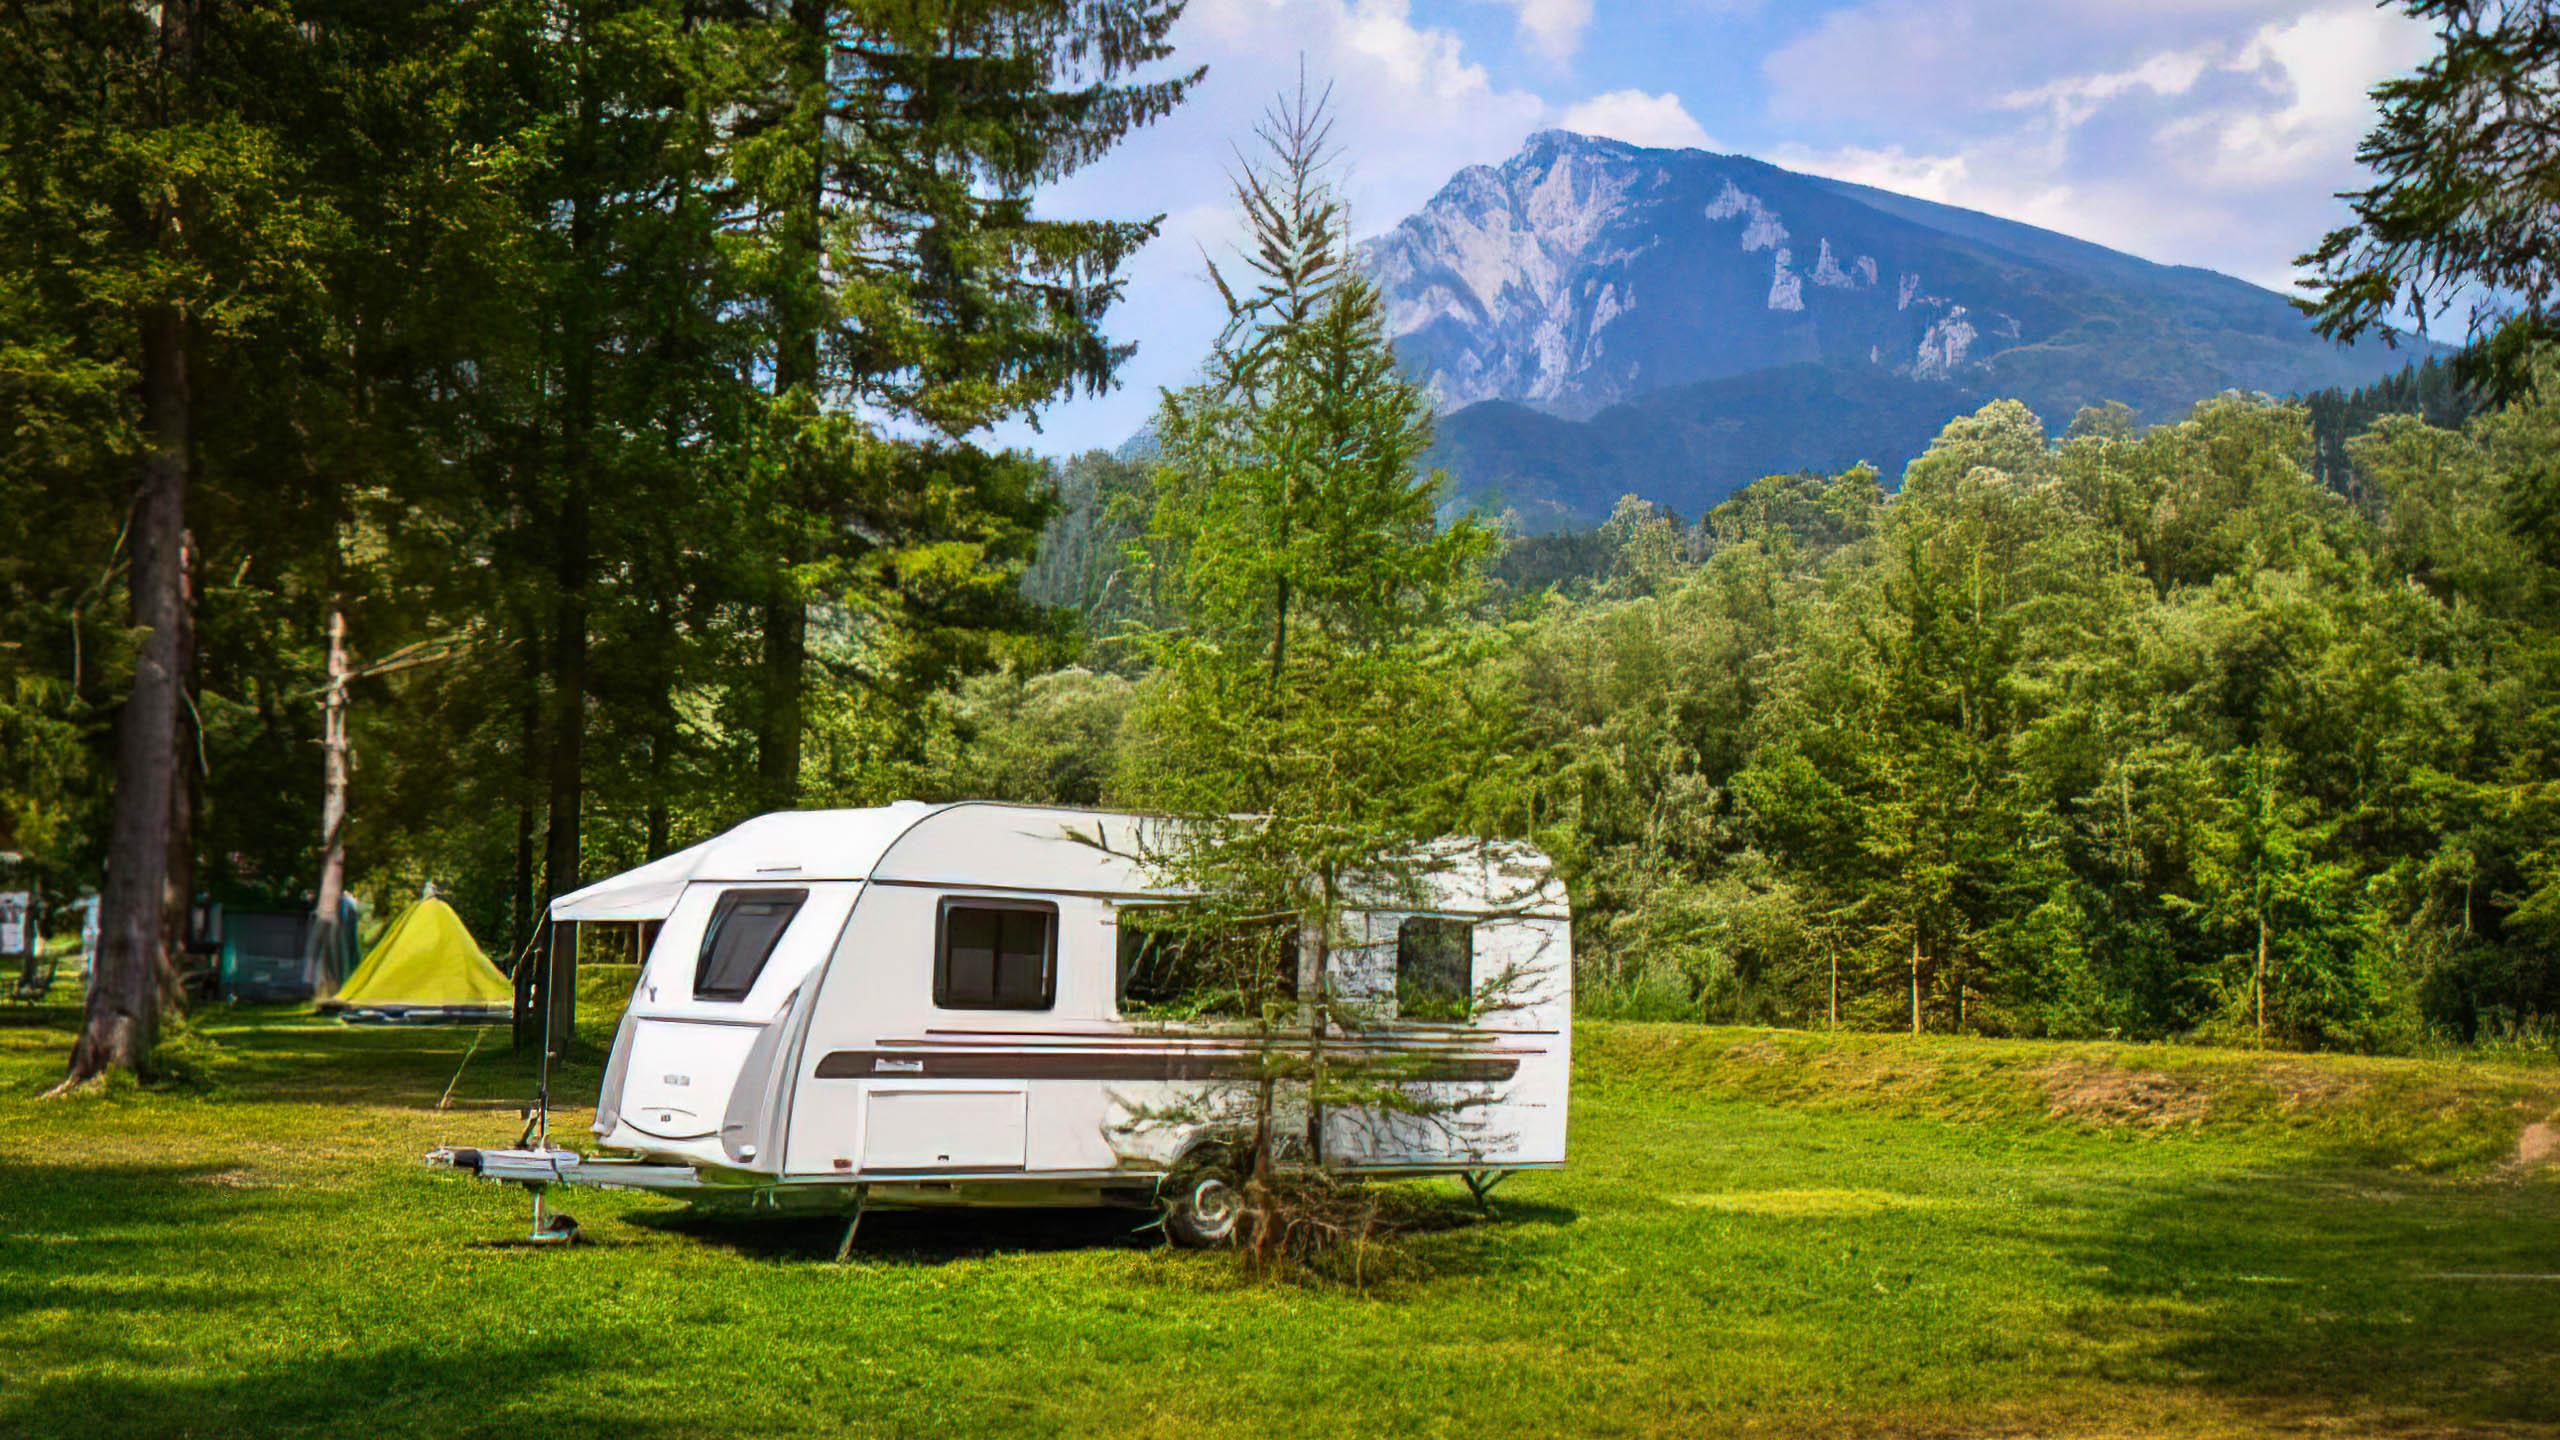 Camp Smica